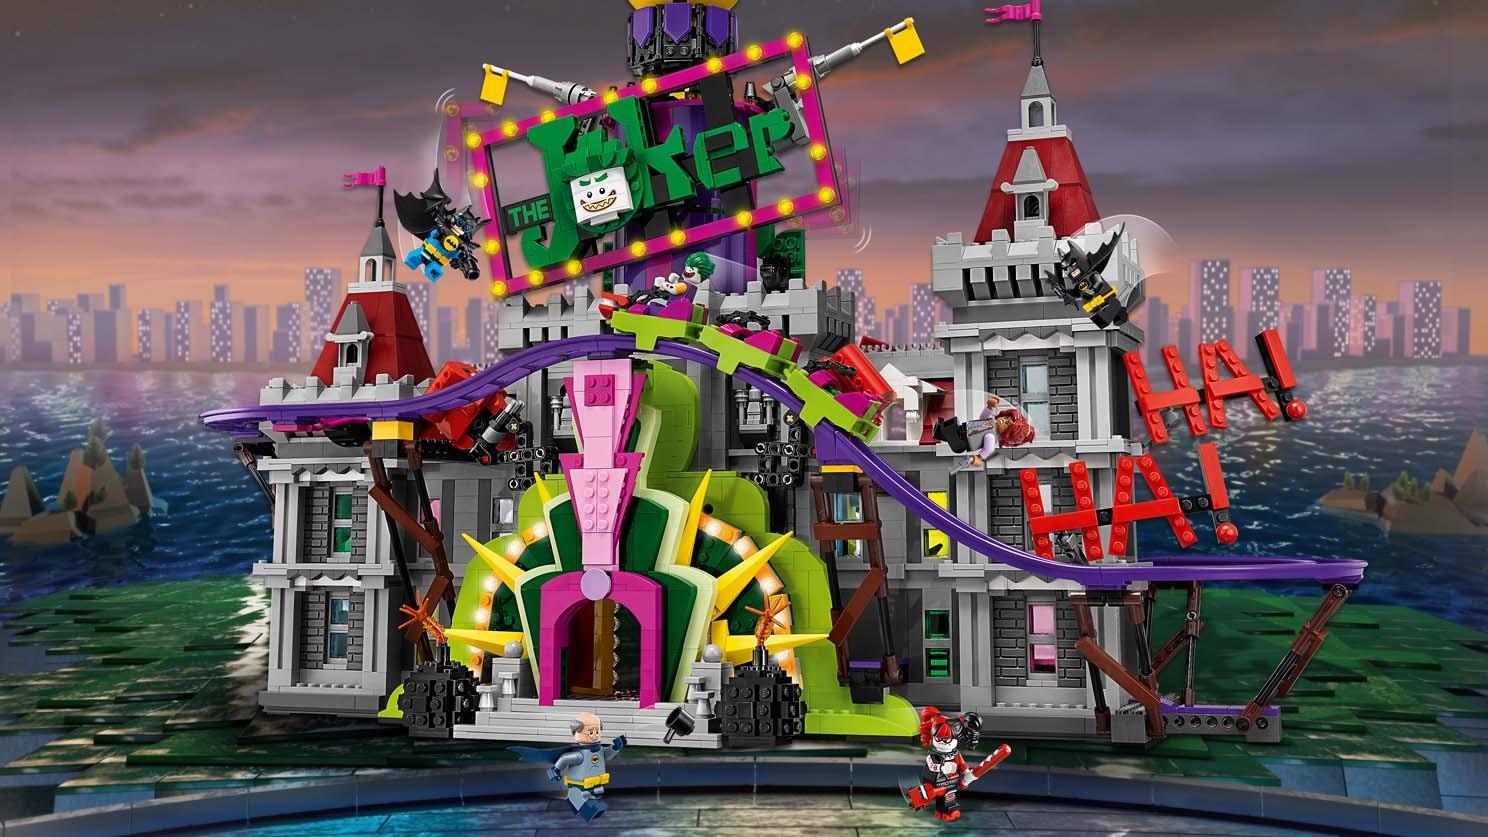 LEGO Batman Movie The Joker Manor - 70922 - The Joker has jokerized Wayne Manor so break in with Batman, Alfred and Barbara Gordon to win it back and have fun!